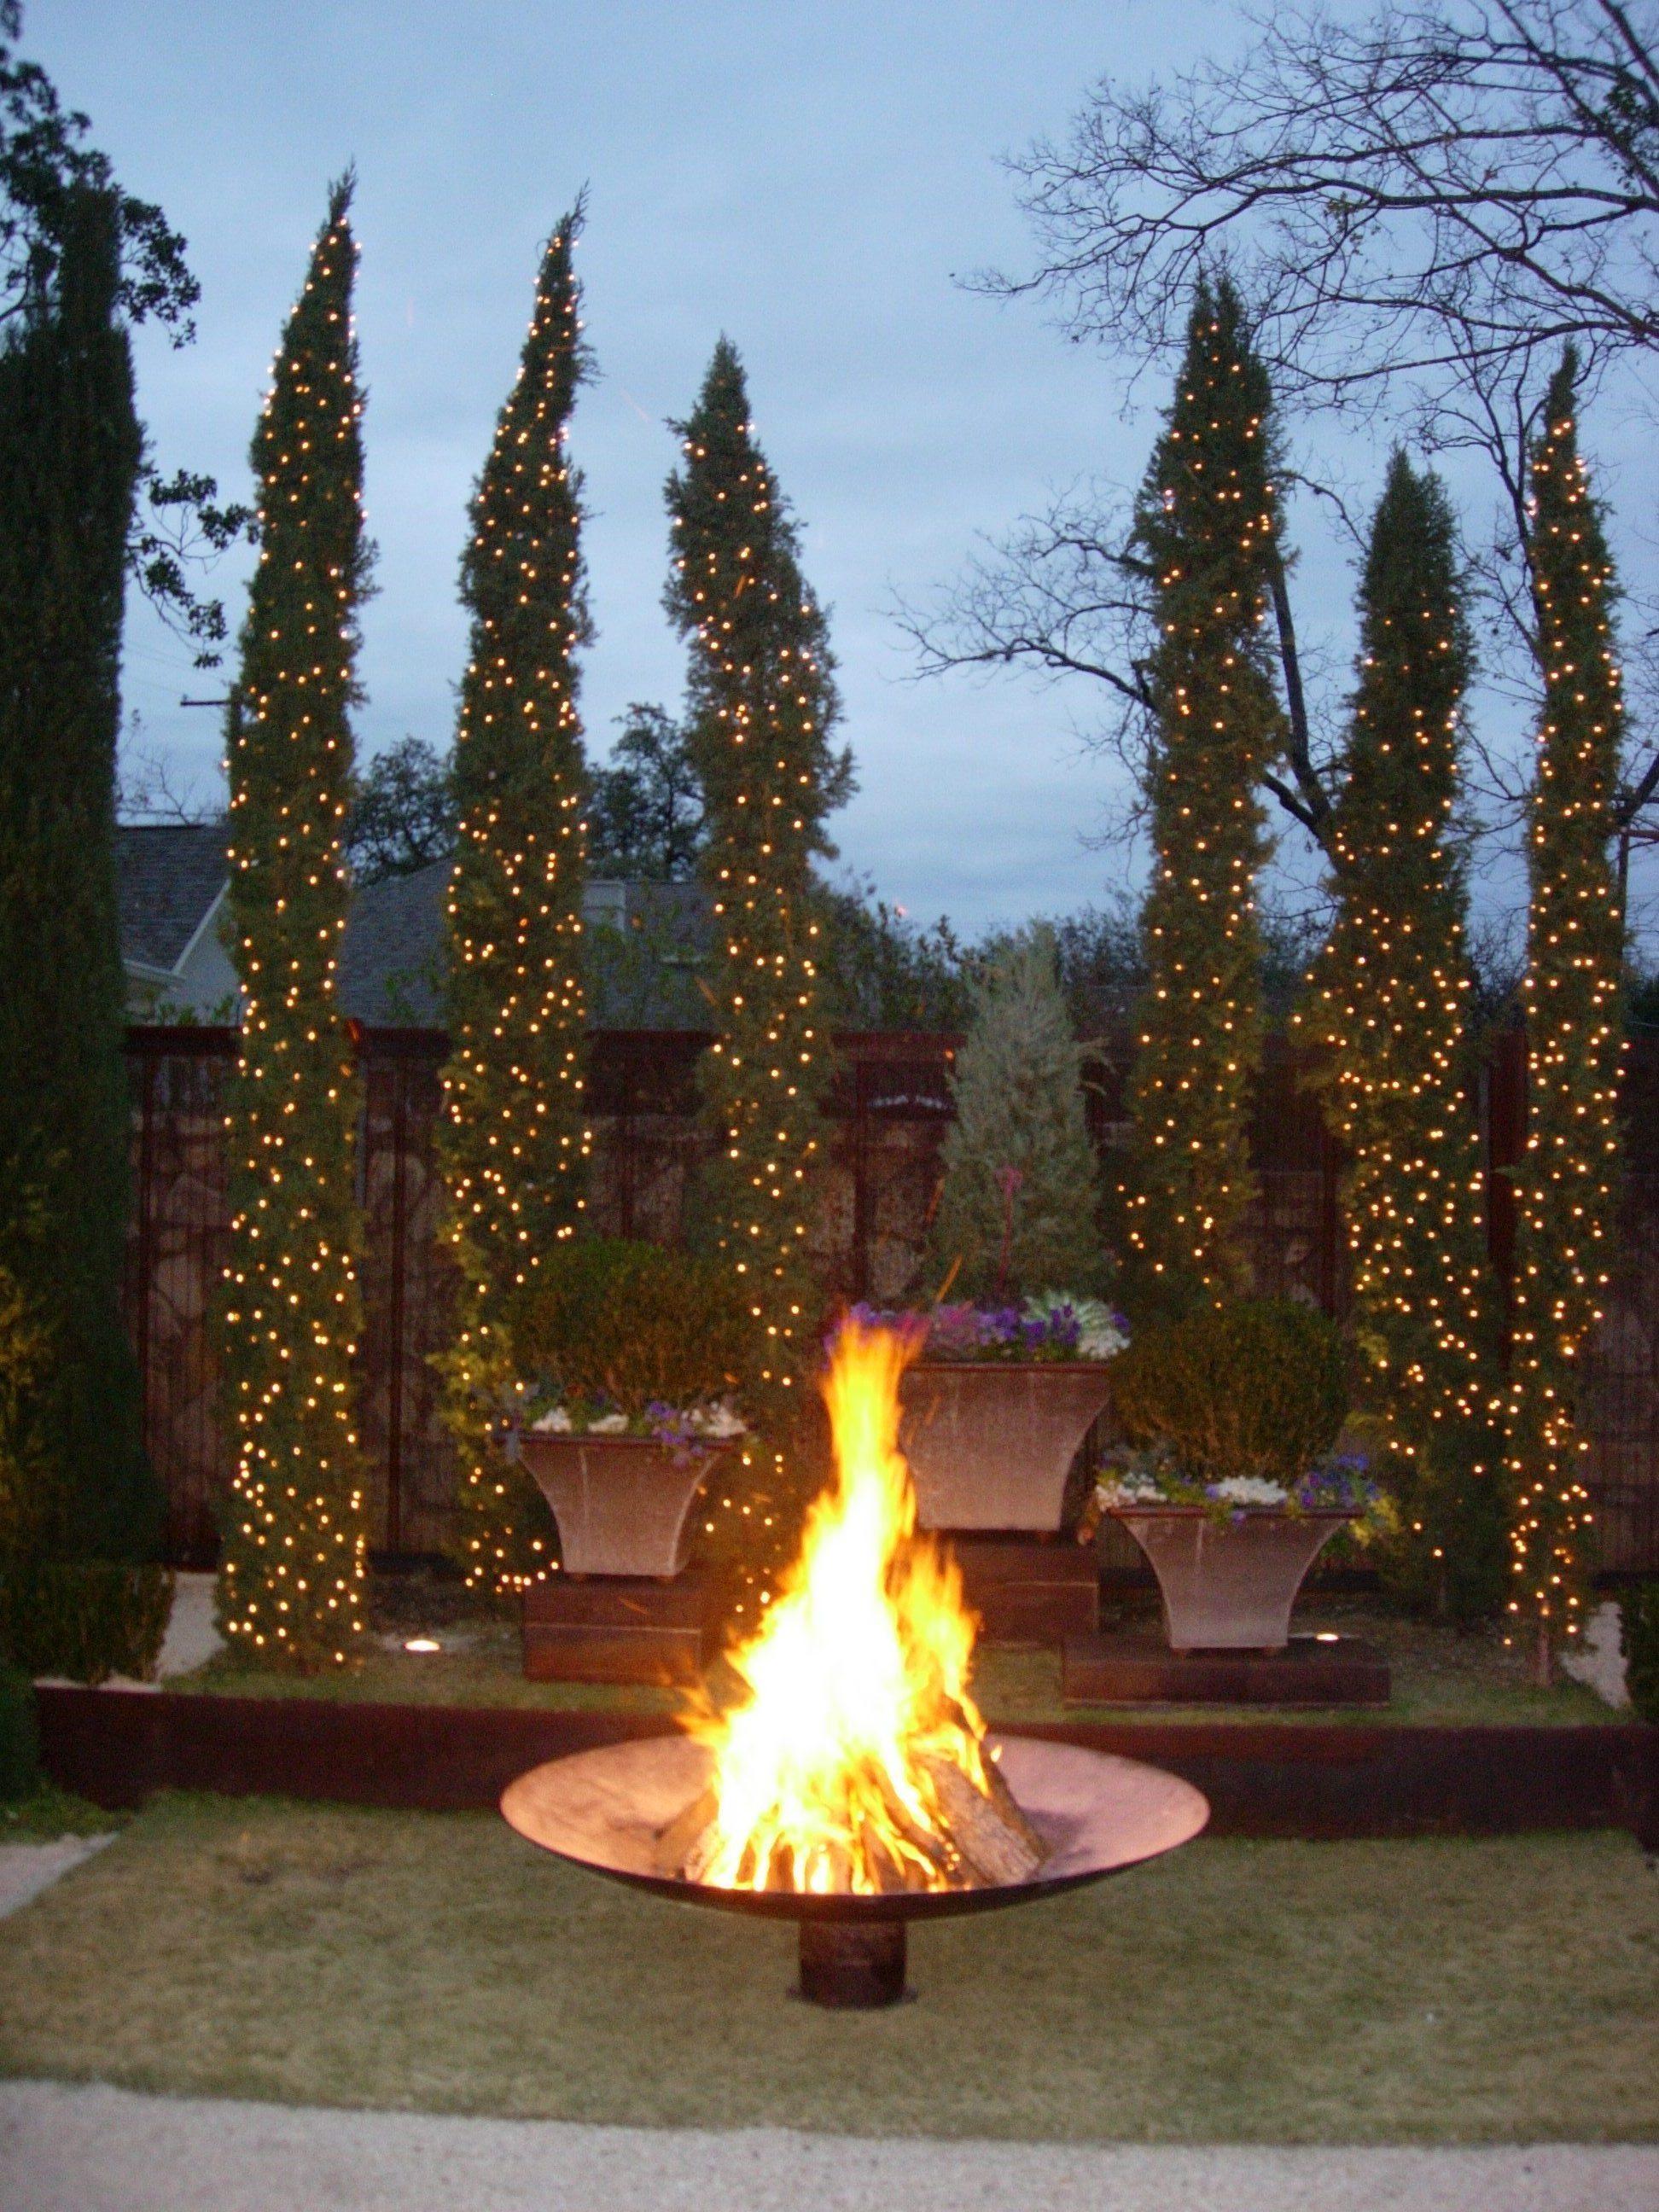 project-pemberton-heihgts-shivers-dish-fire-garden-italian-cypress.JPG